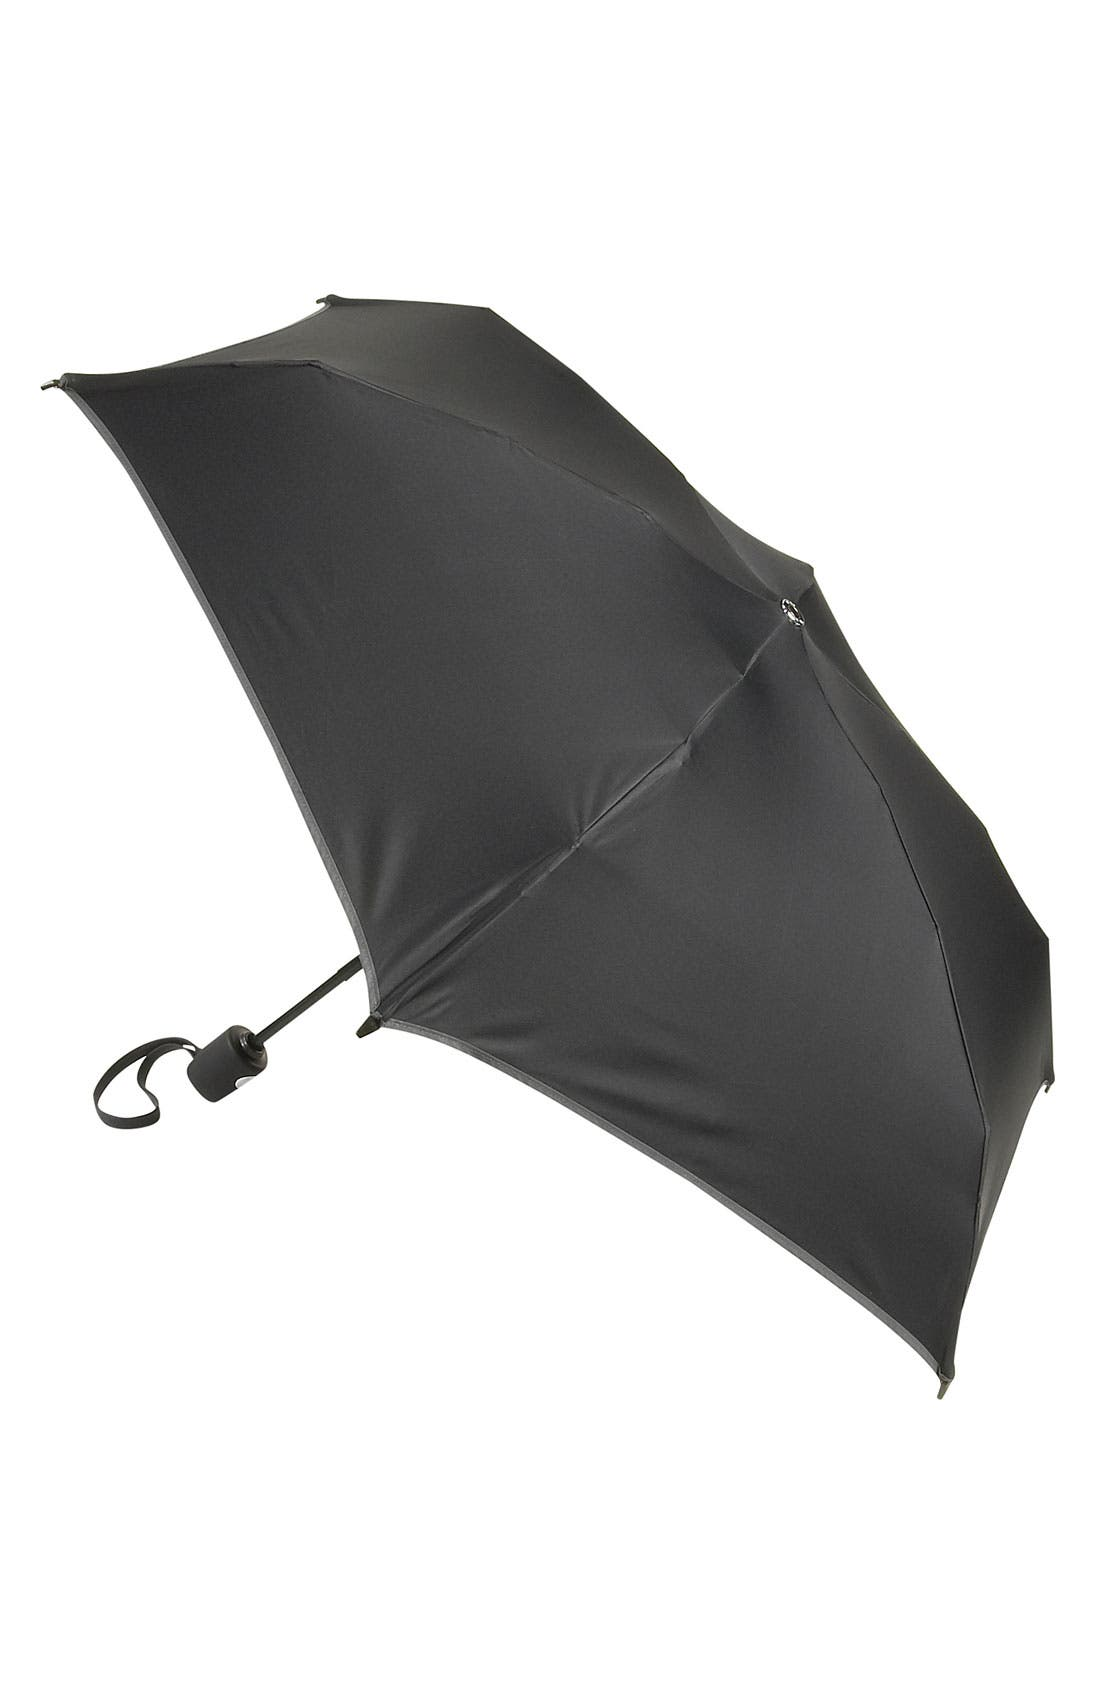 Alternate Image 1 Selected - Tumi Small Auto Close Umbrella